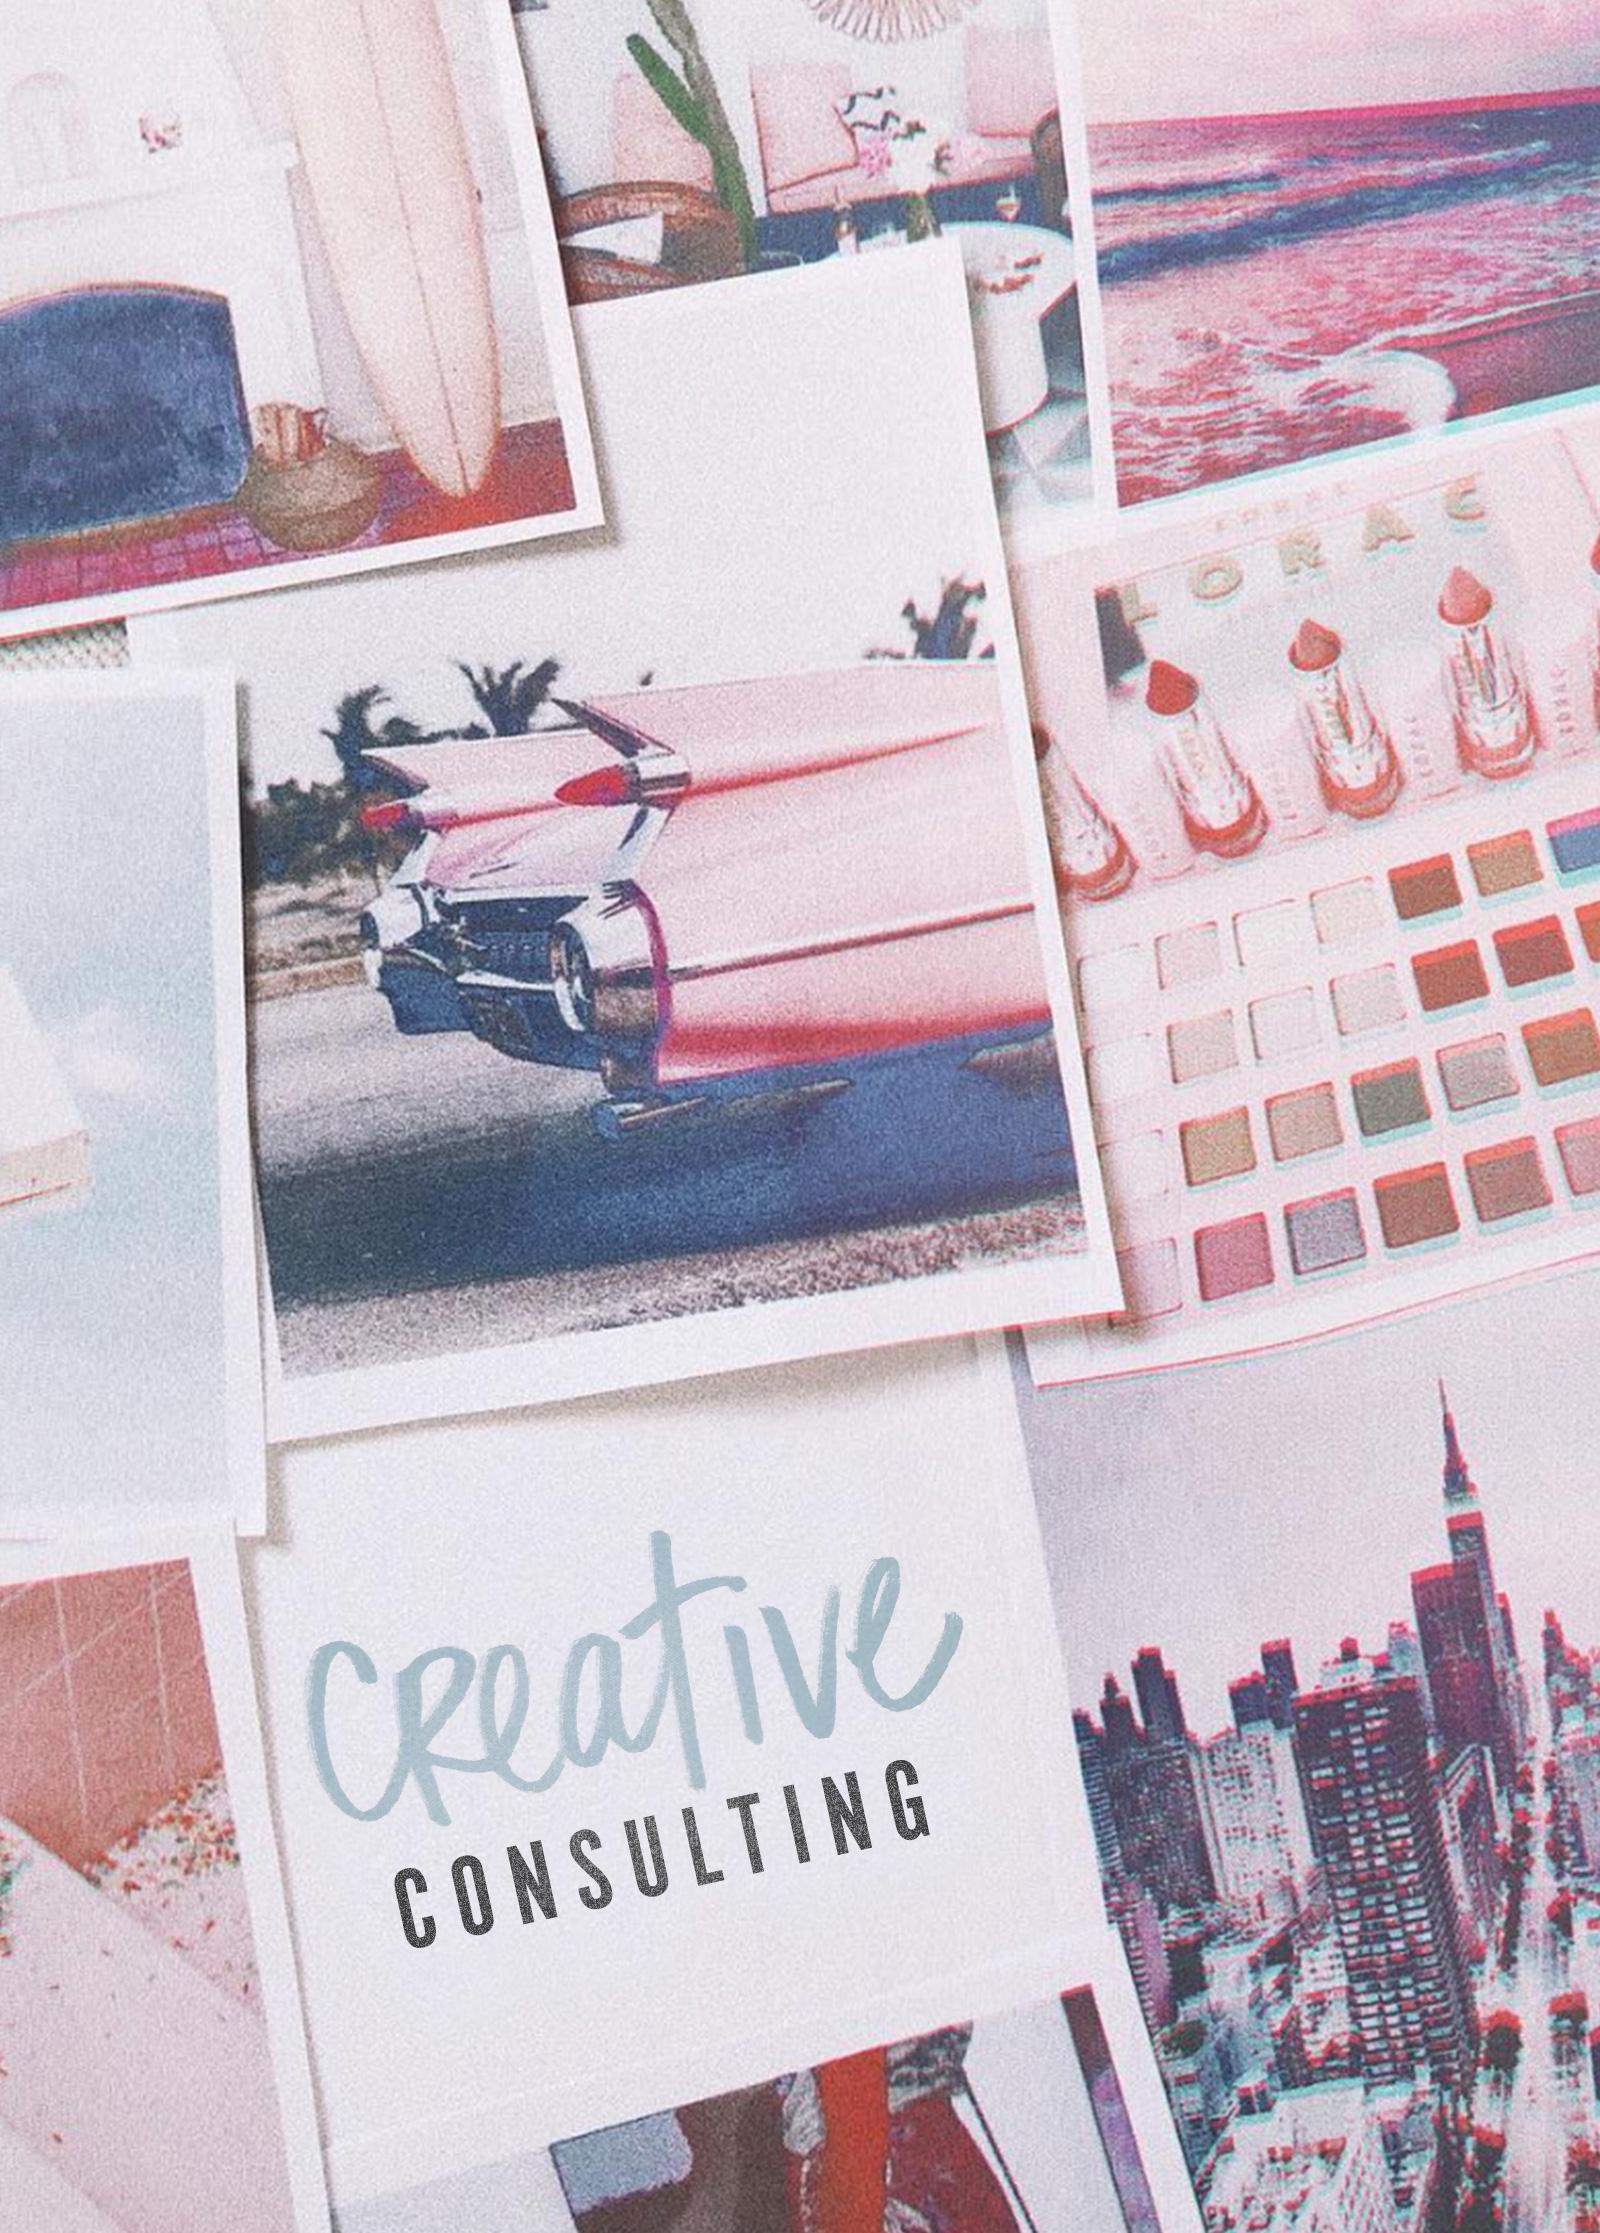 kelly-wirht-creative-consulting-moodboard-2.jpg